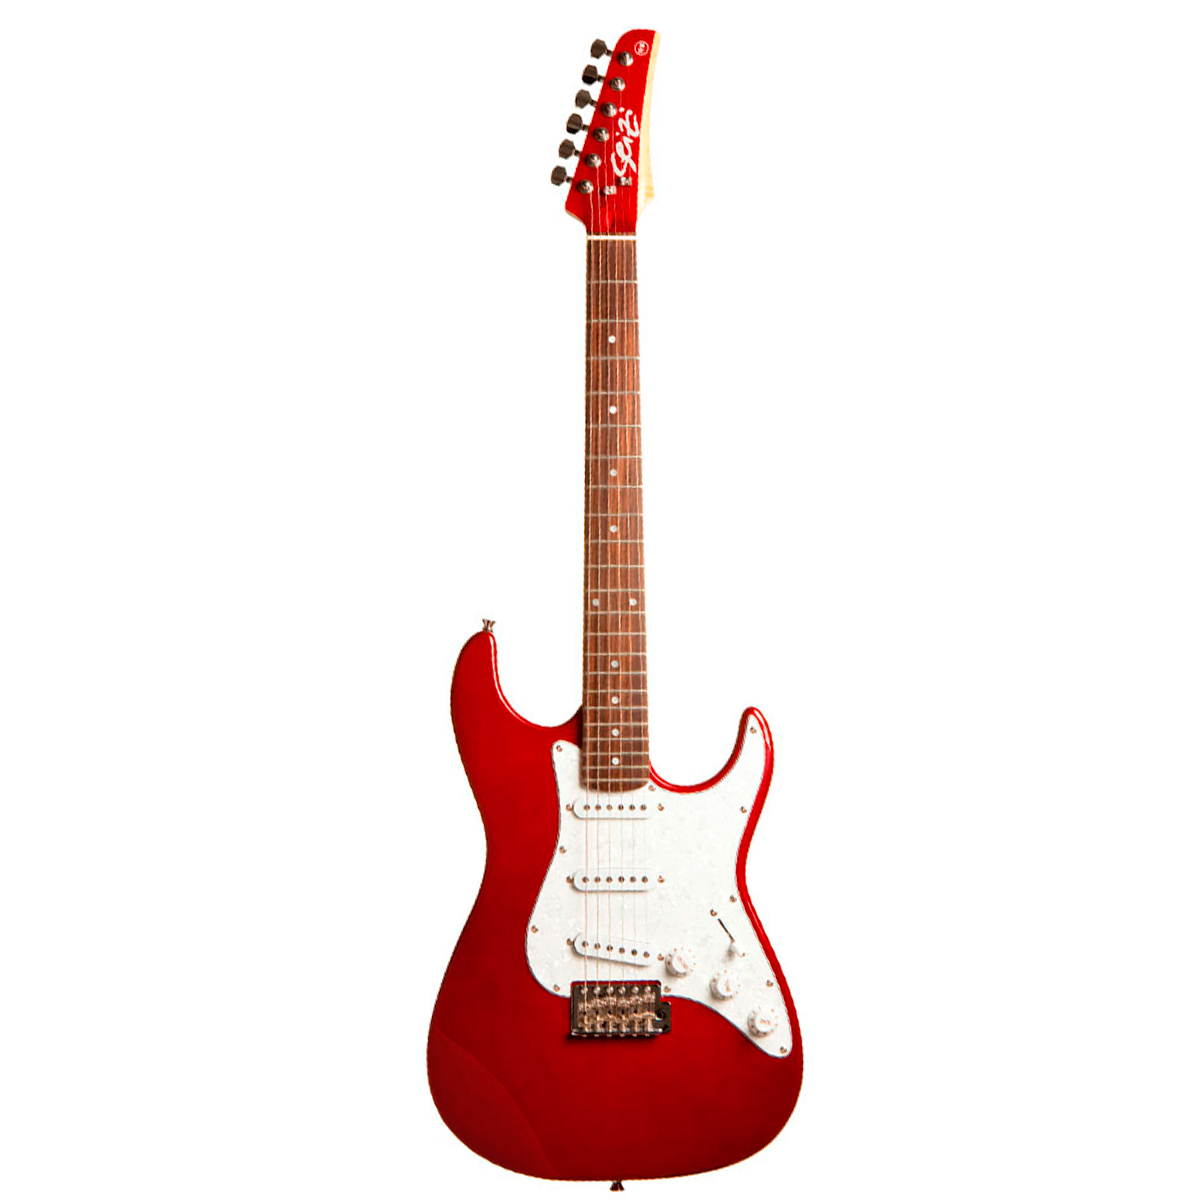 Guitarra Vision Metallic Red c/ Escudo Branco Perolado - Seizi